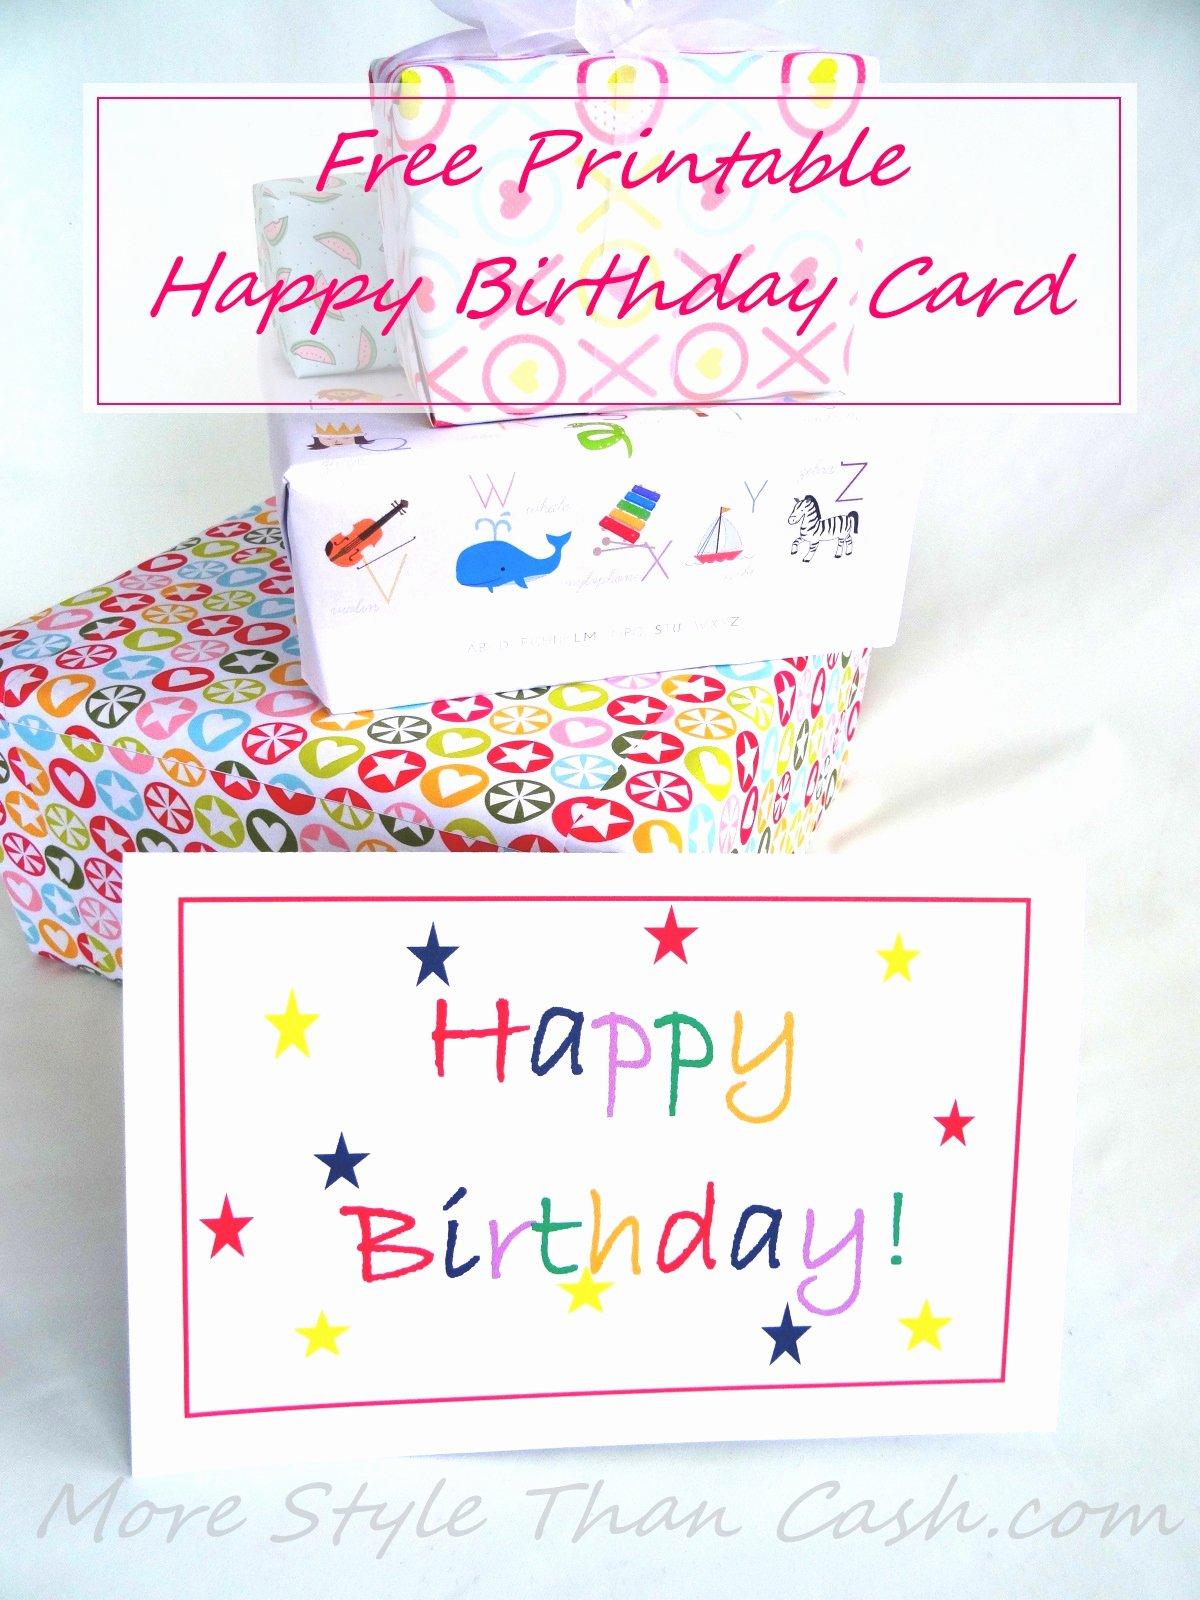 Printable Anniversary Cards Free Best Of Free Printable Birthday Card